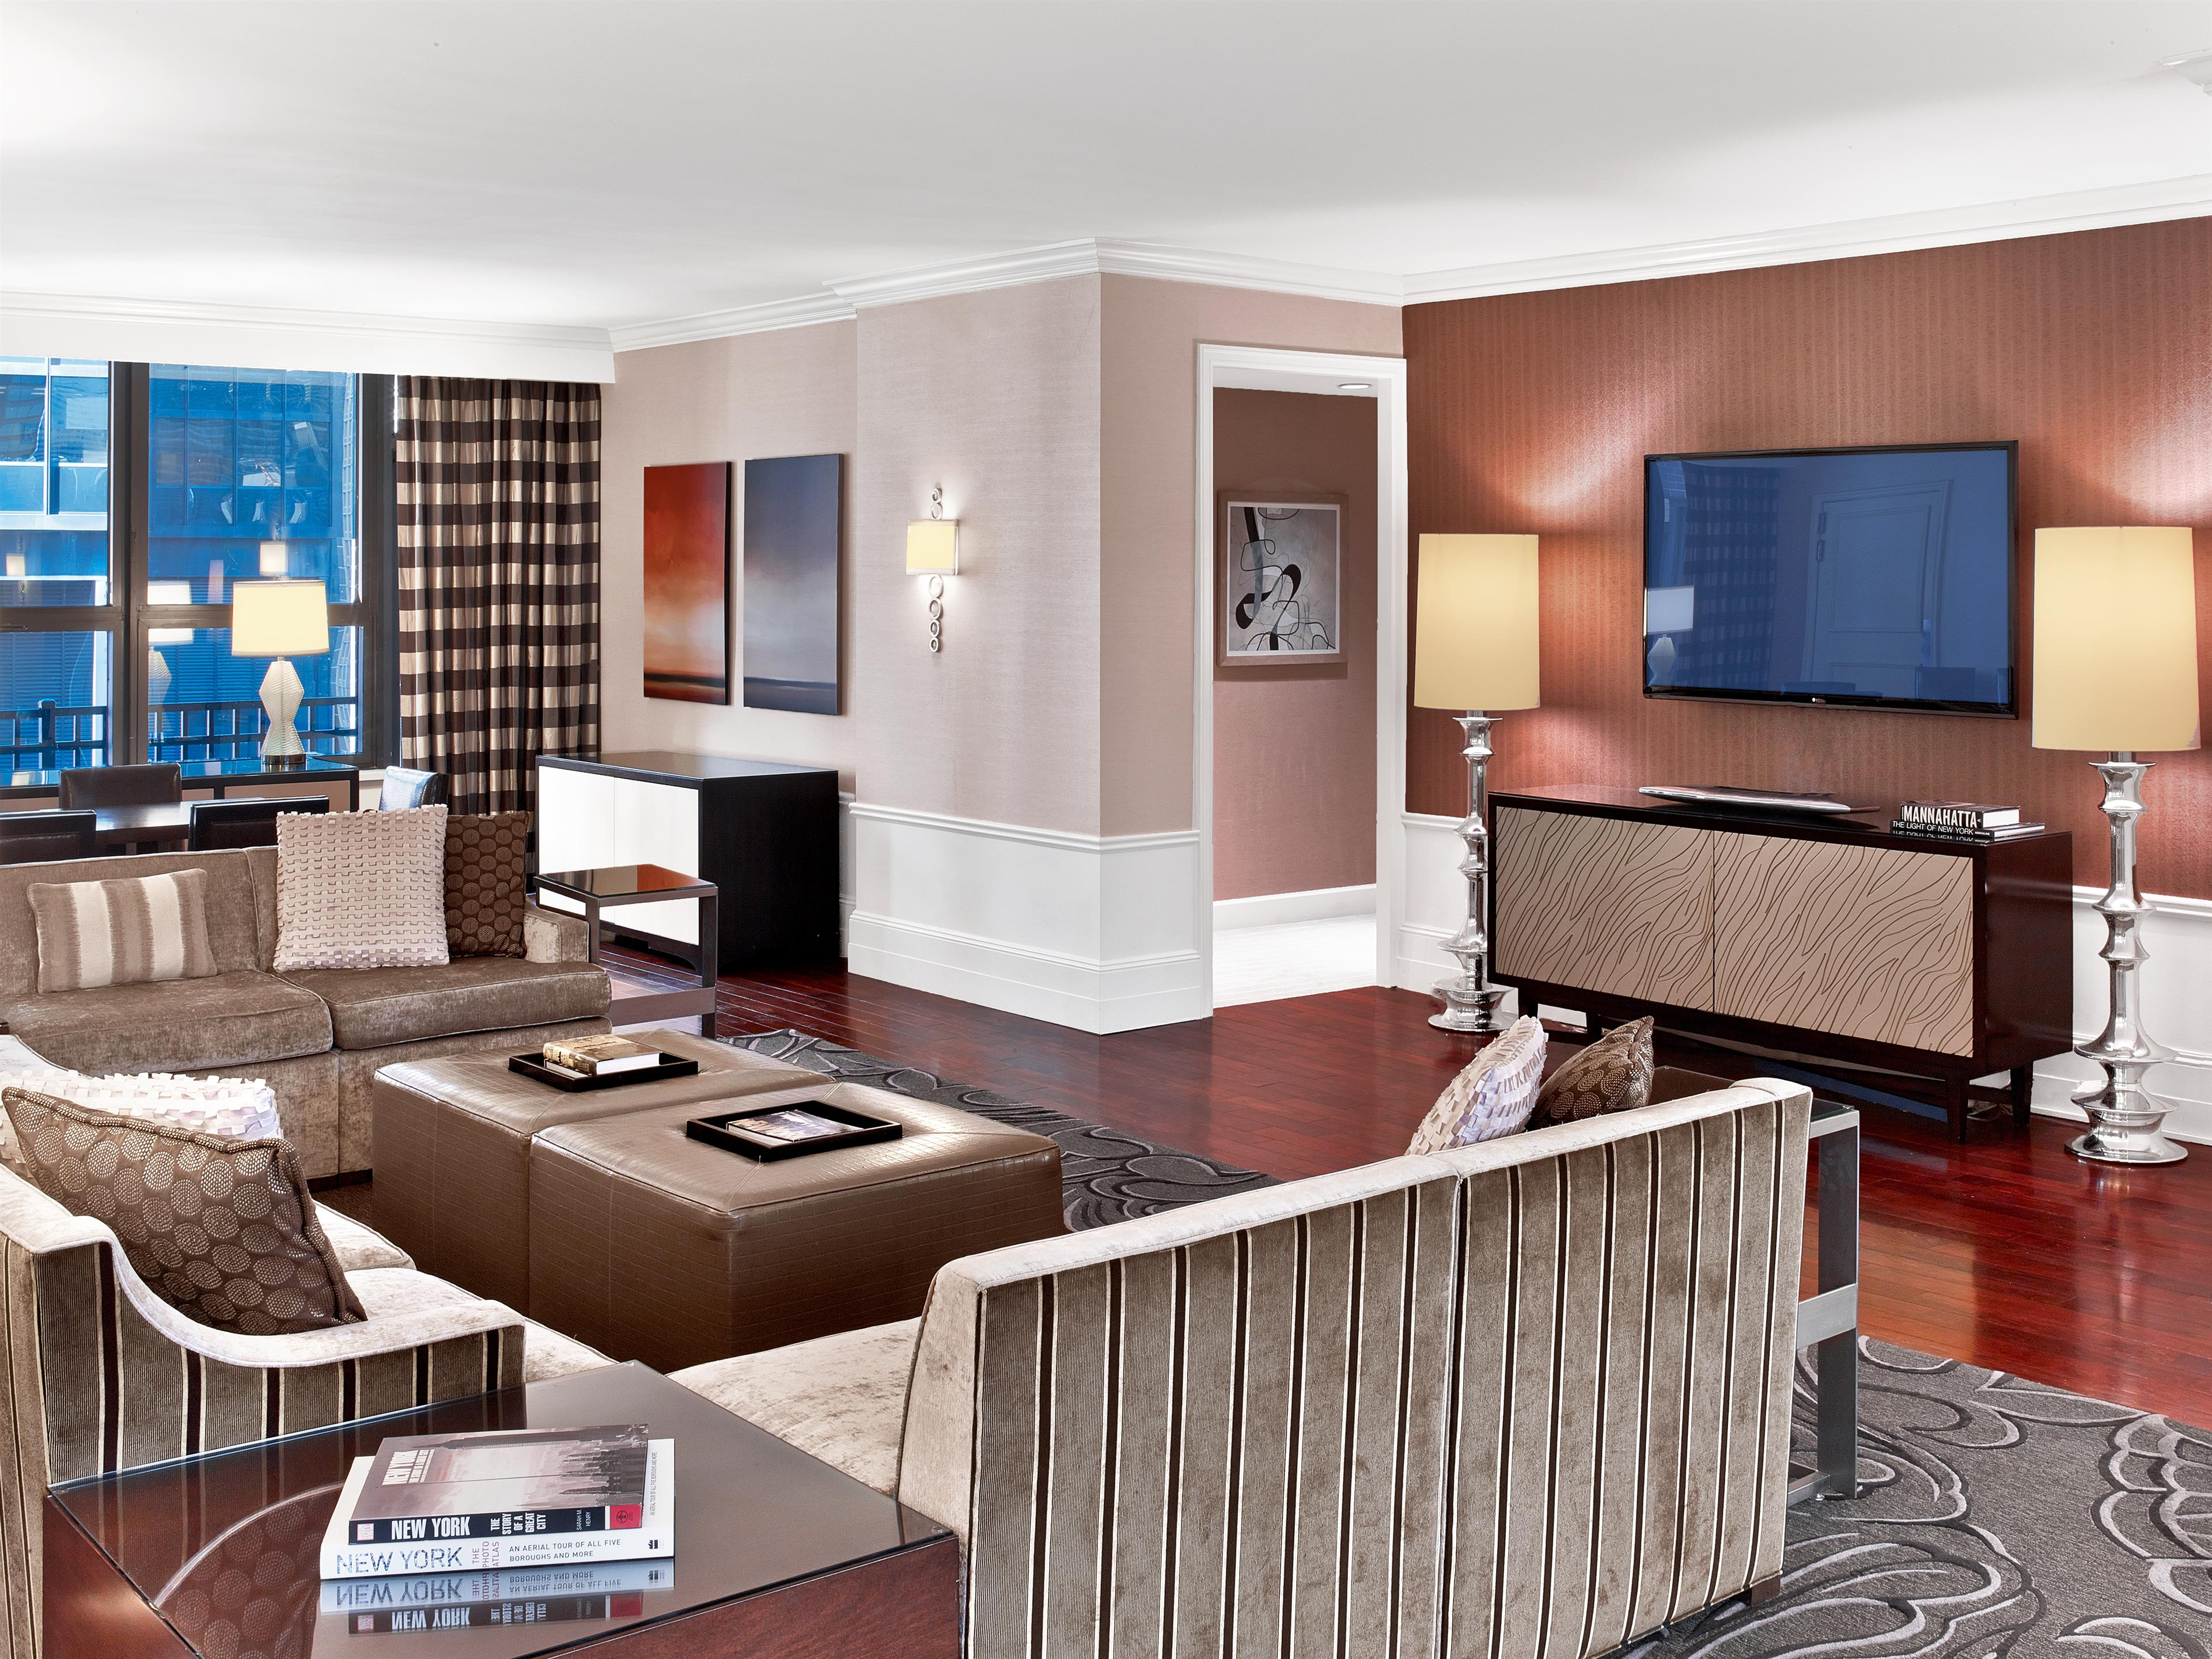 Sheraton New York Times Square Hotel image 43